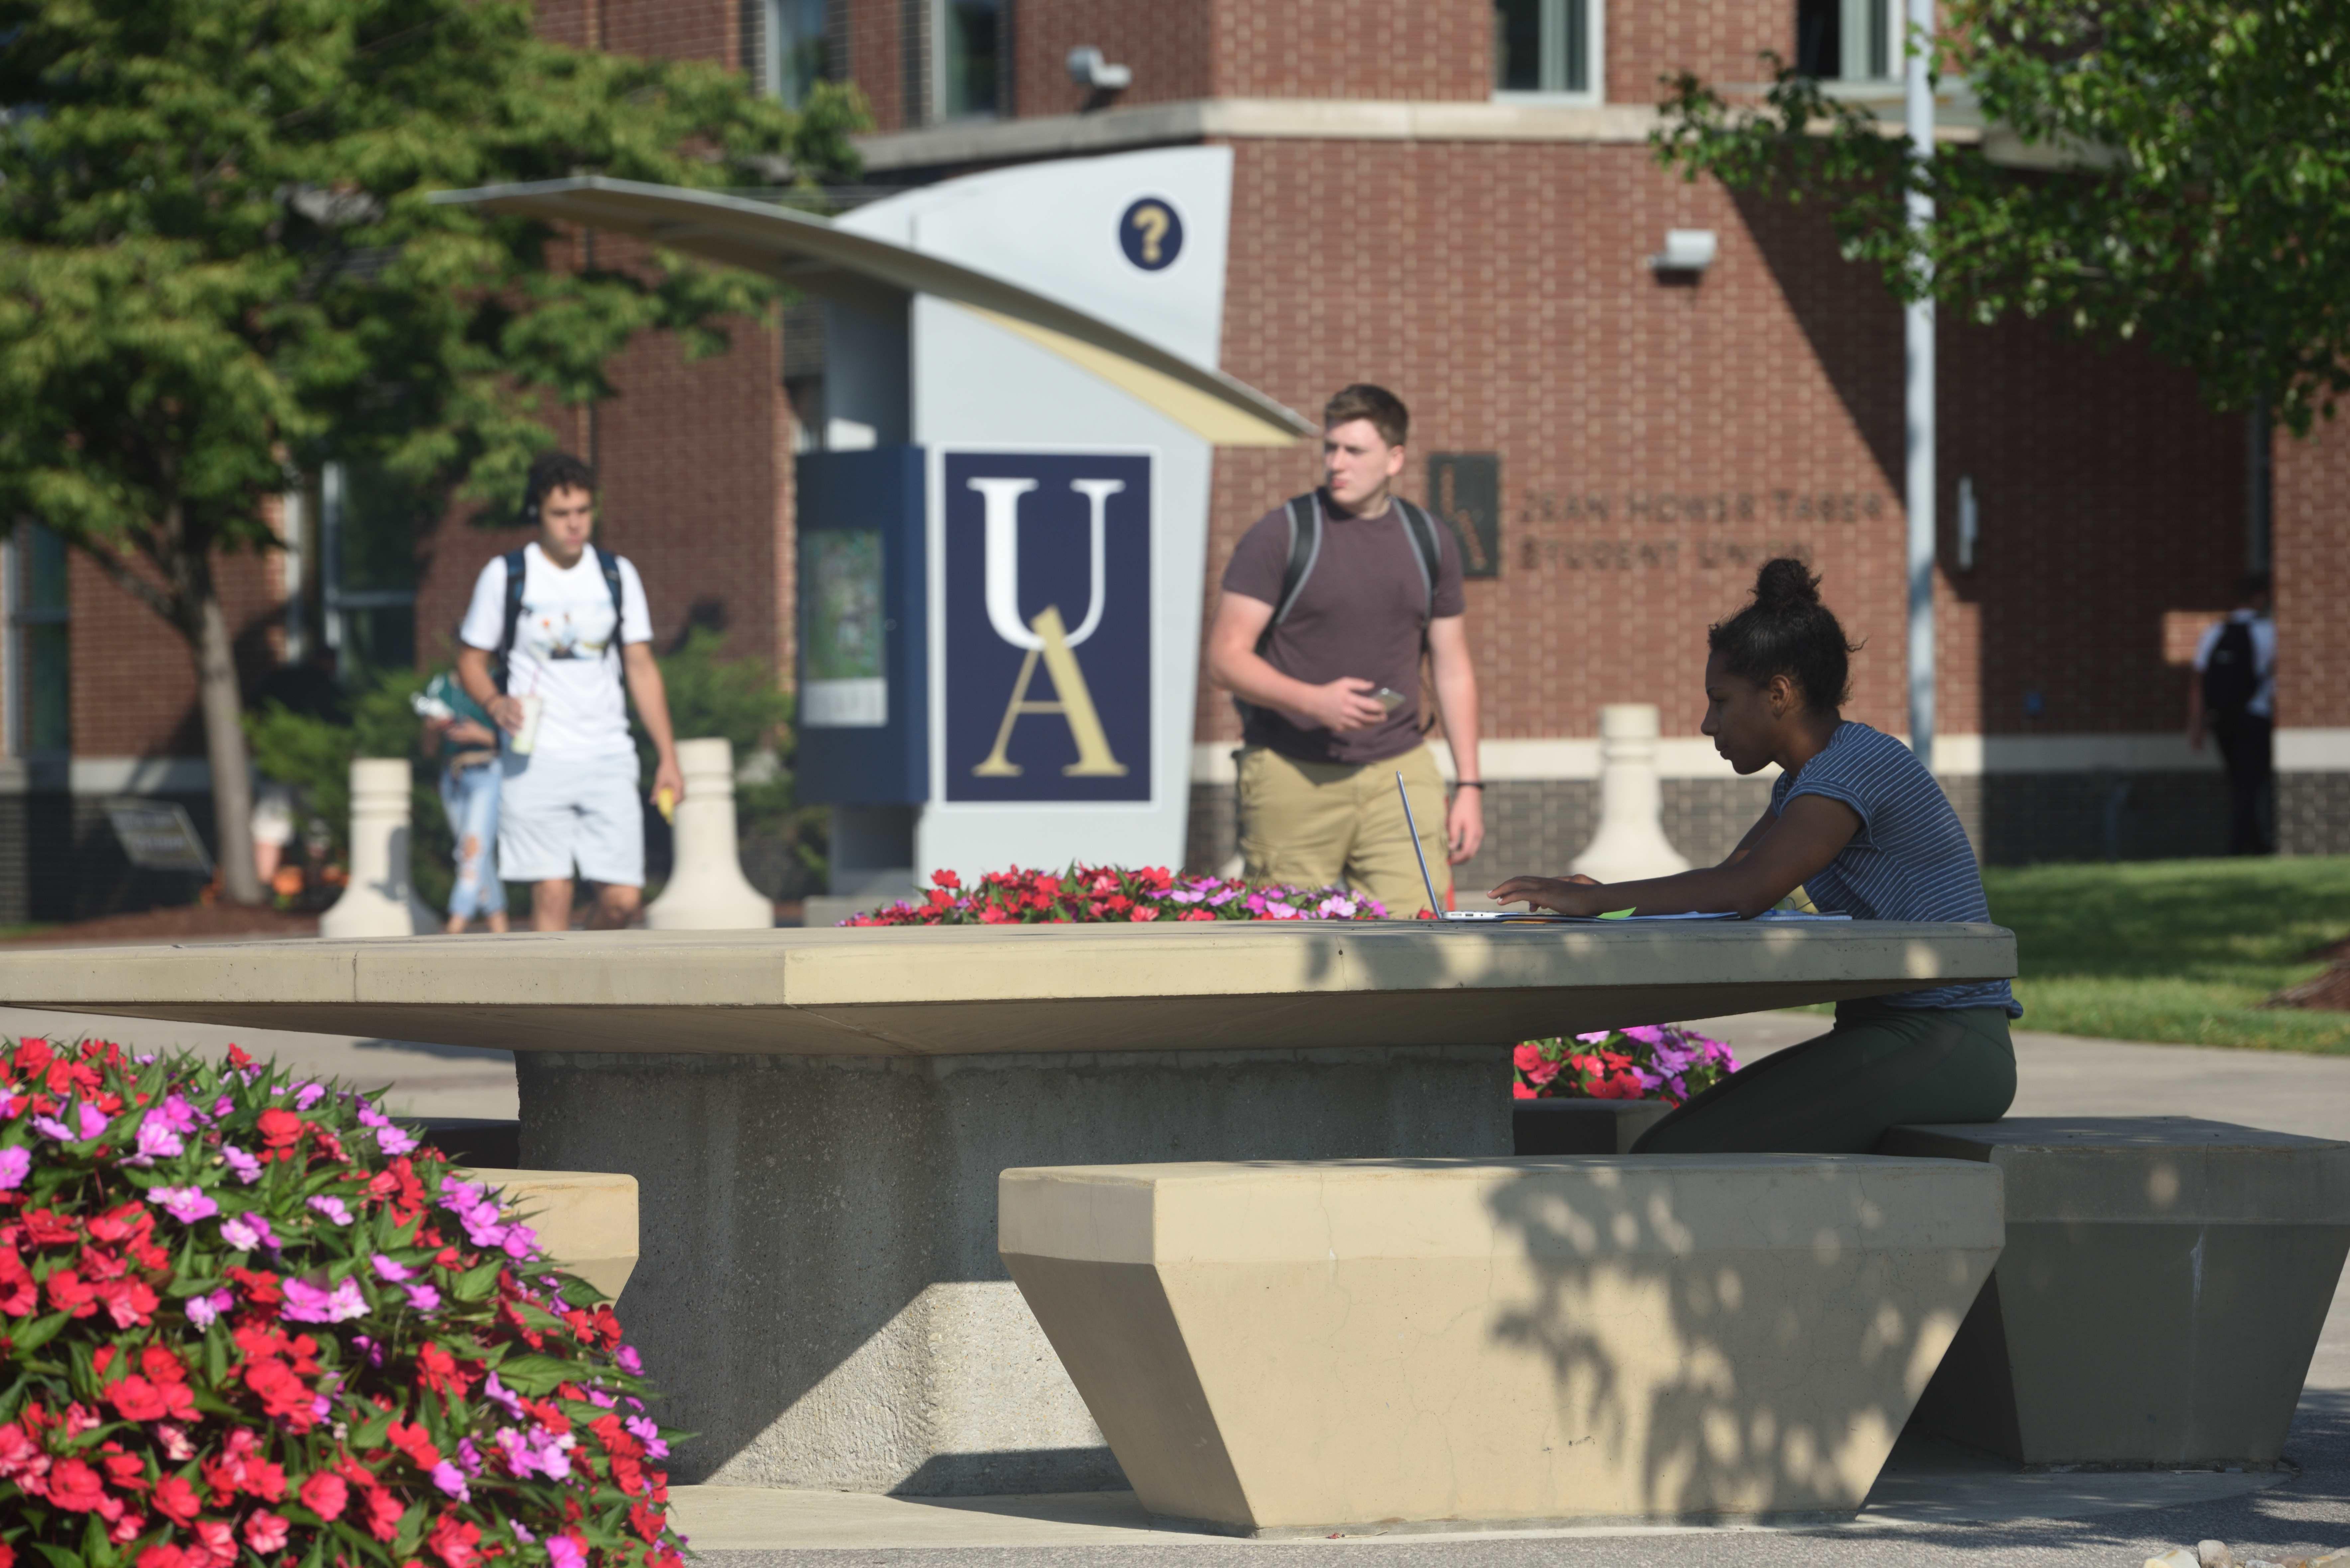 Morning Headlines: Ohio Schools Covid 19 Update; Events In Akron University Spring Break 2020